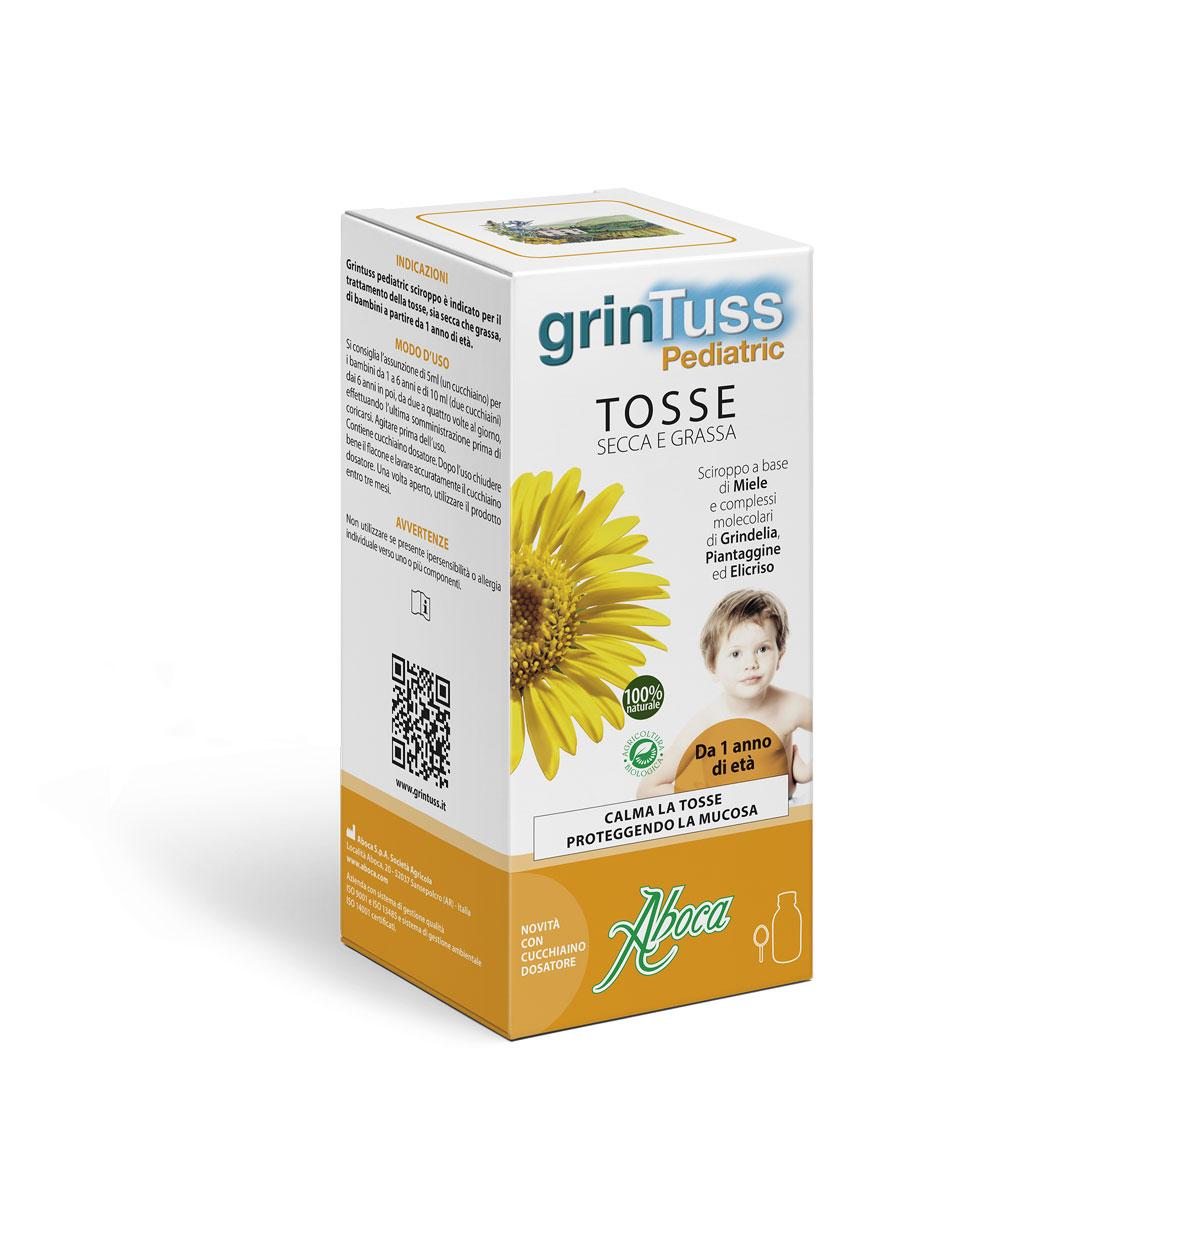 Image of Aboca GrinTuss Pediatric Sciroppo 180g 927091203